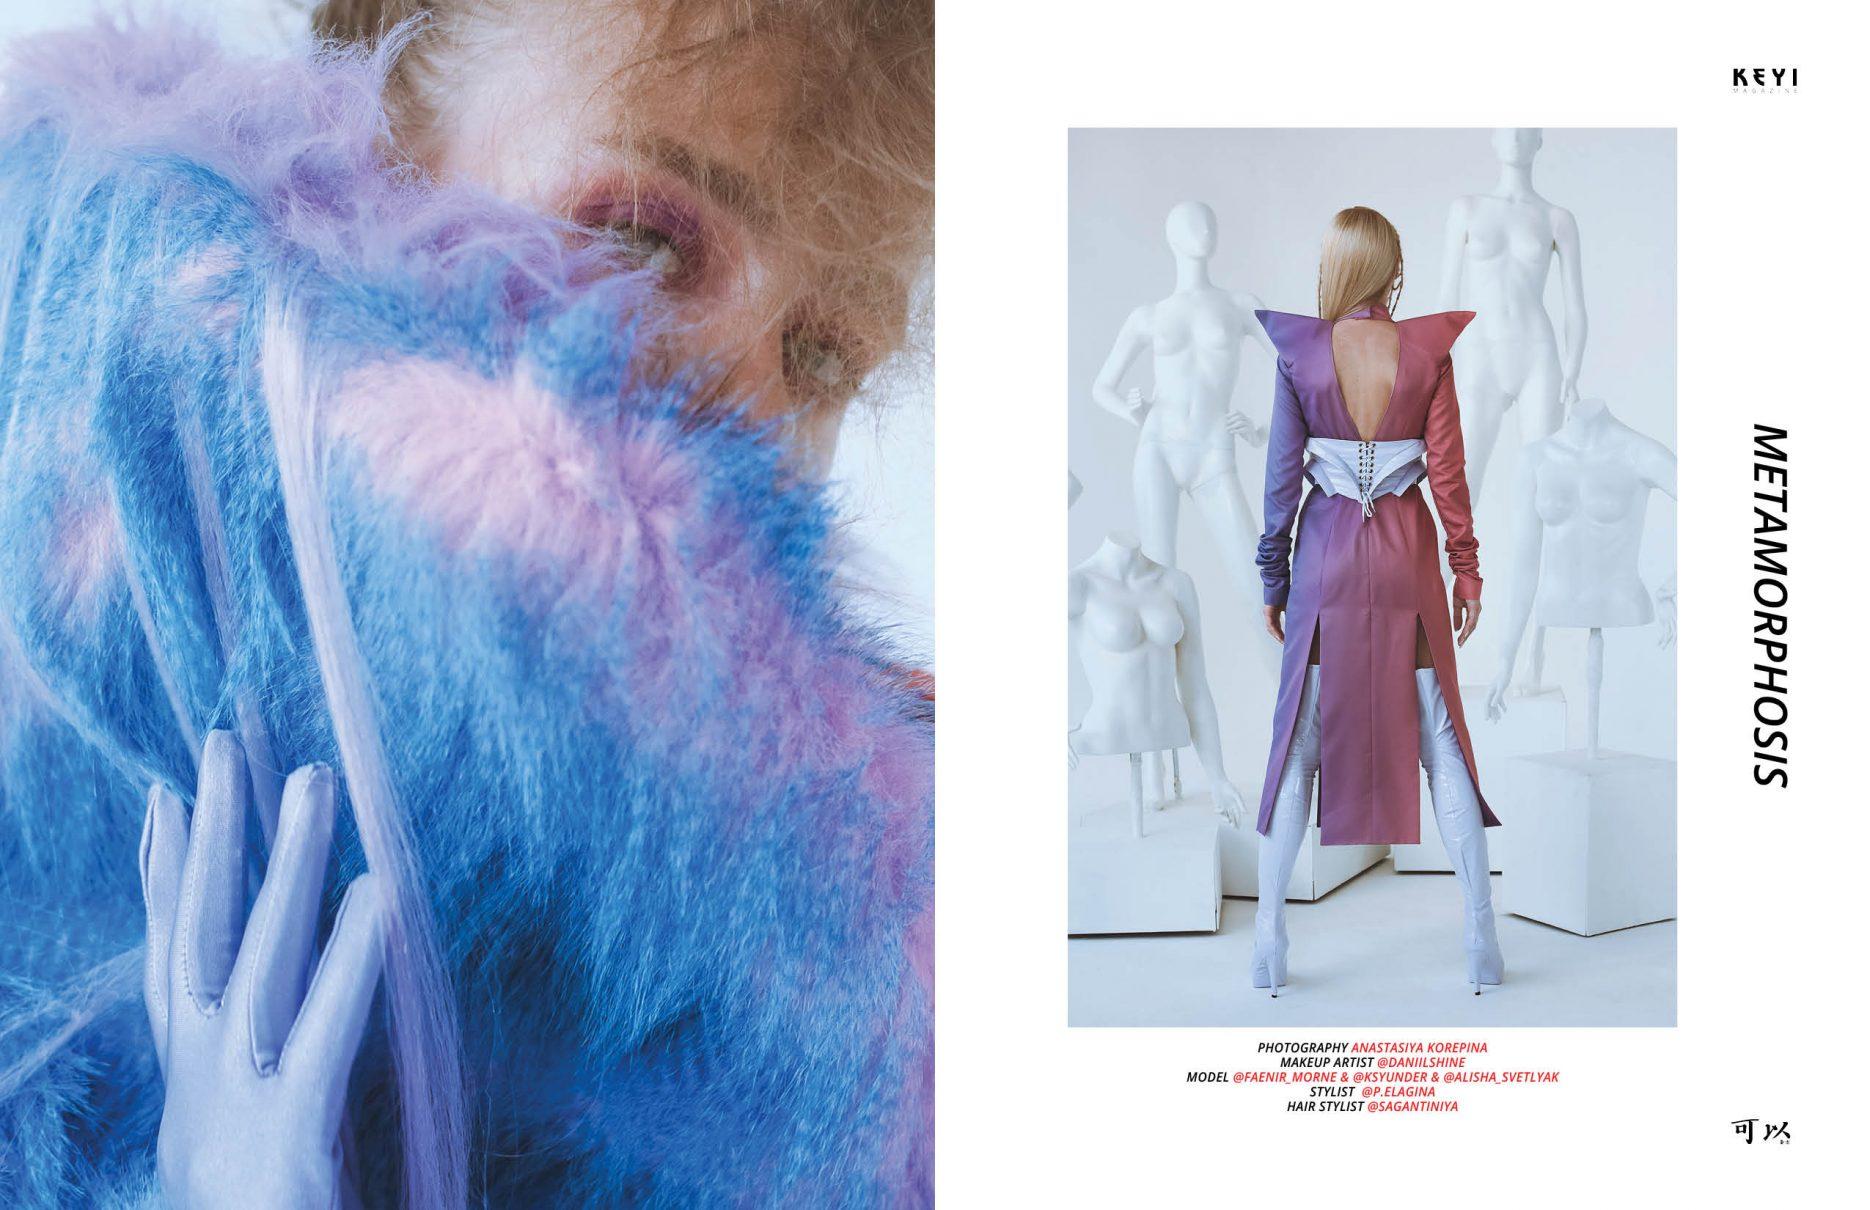 photoshoot metamorphosis by Anastasiya Korepina for keyi magazine berlin